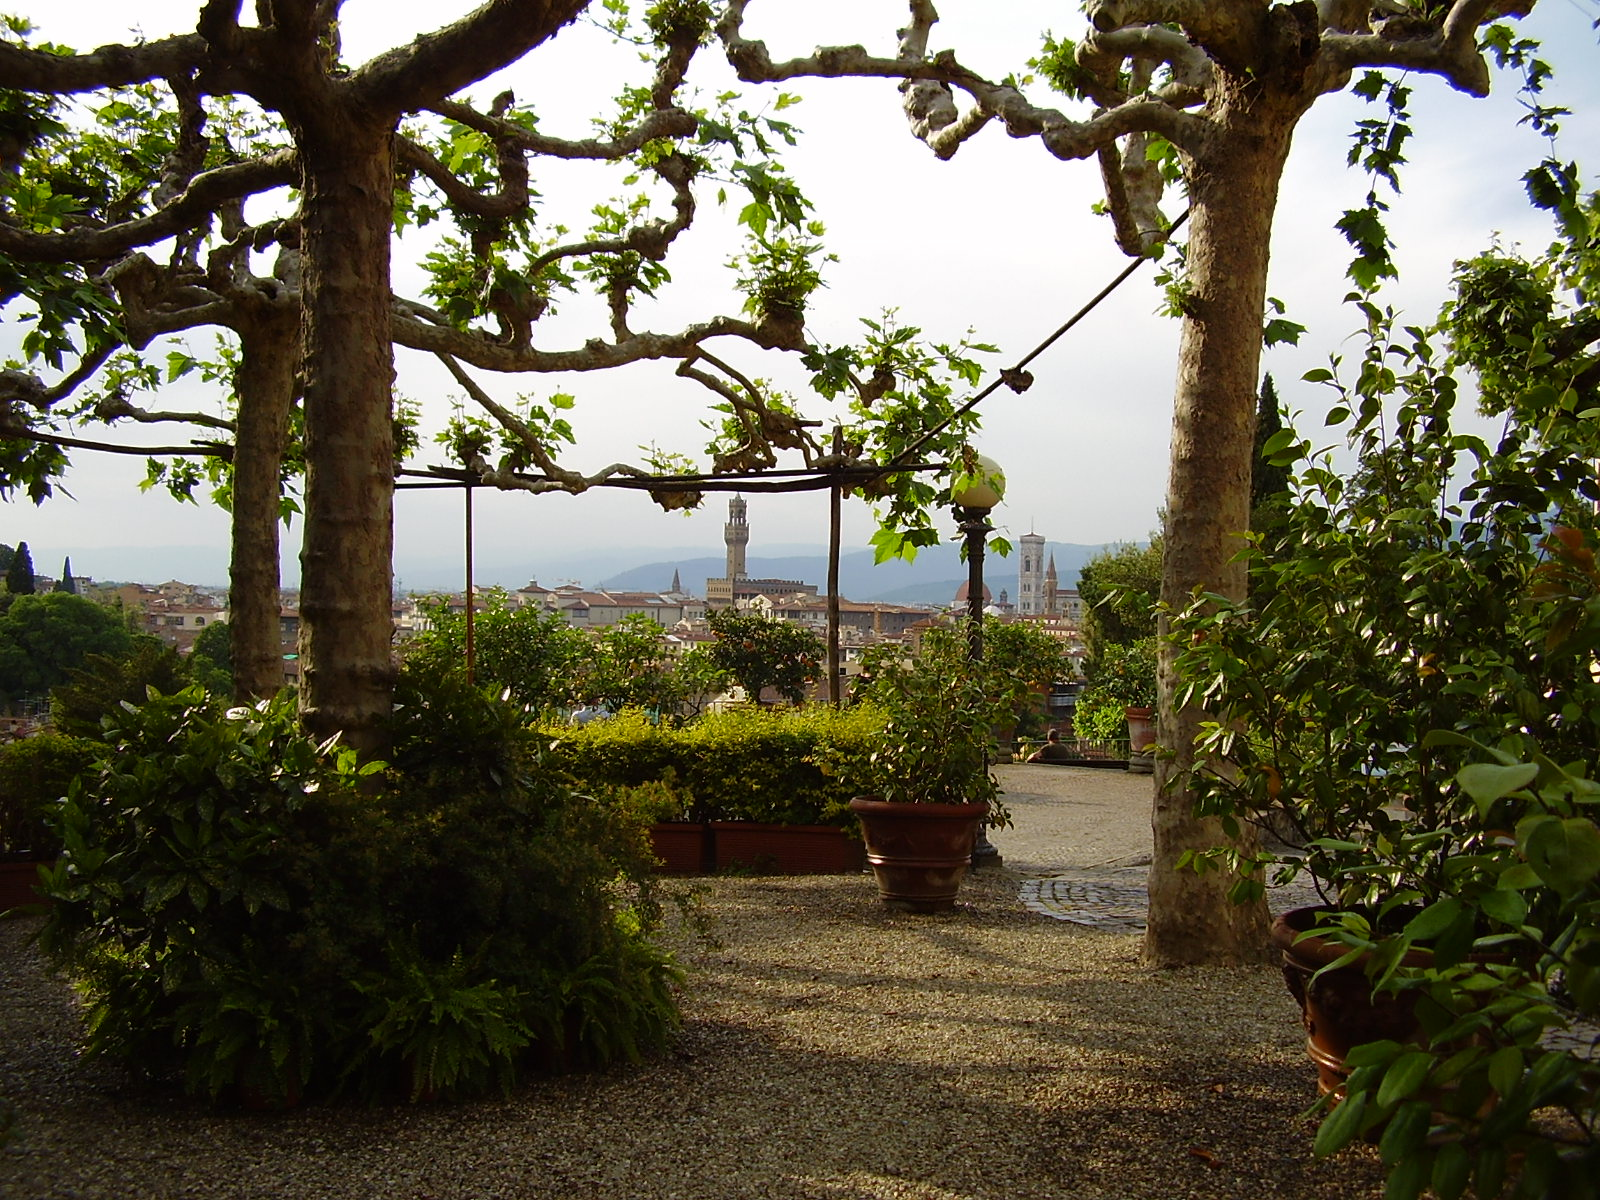 Giardino delle rose luoghi italianbotanicaltrips - Il giardino delle rose ...